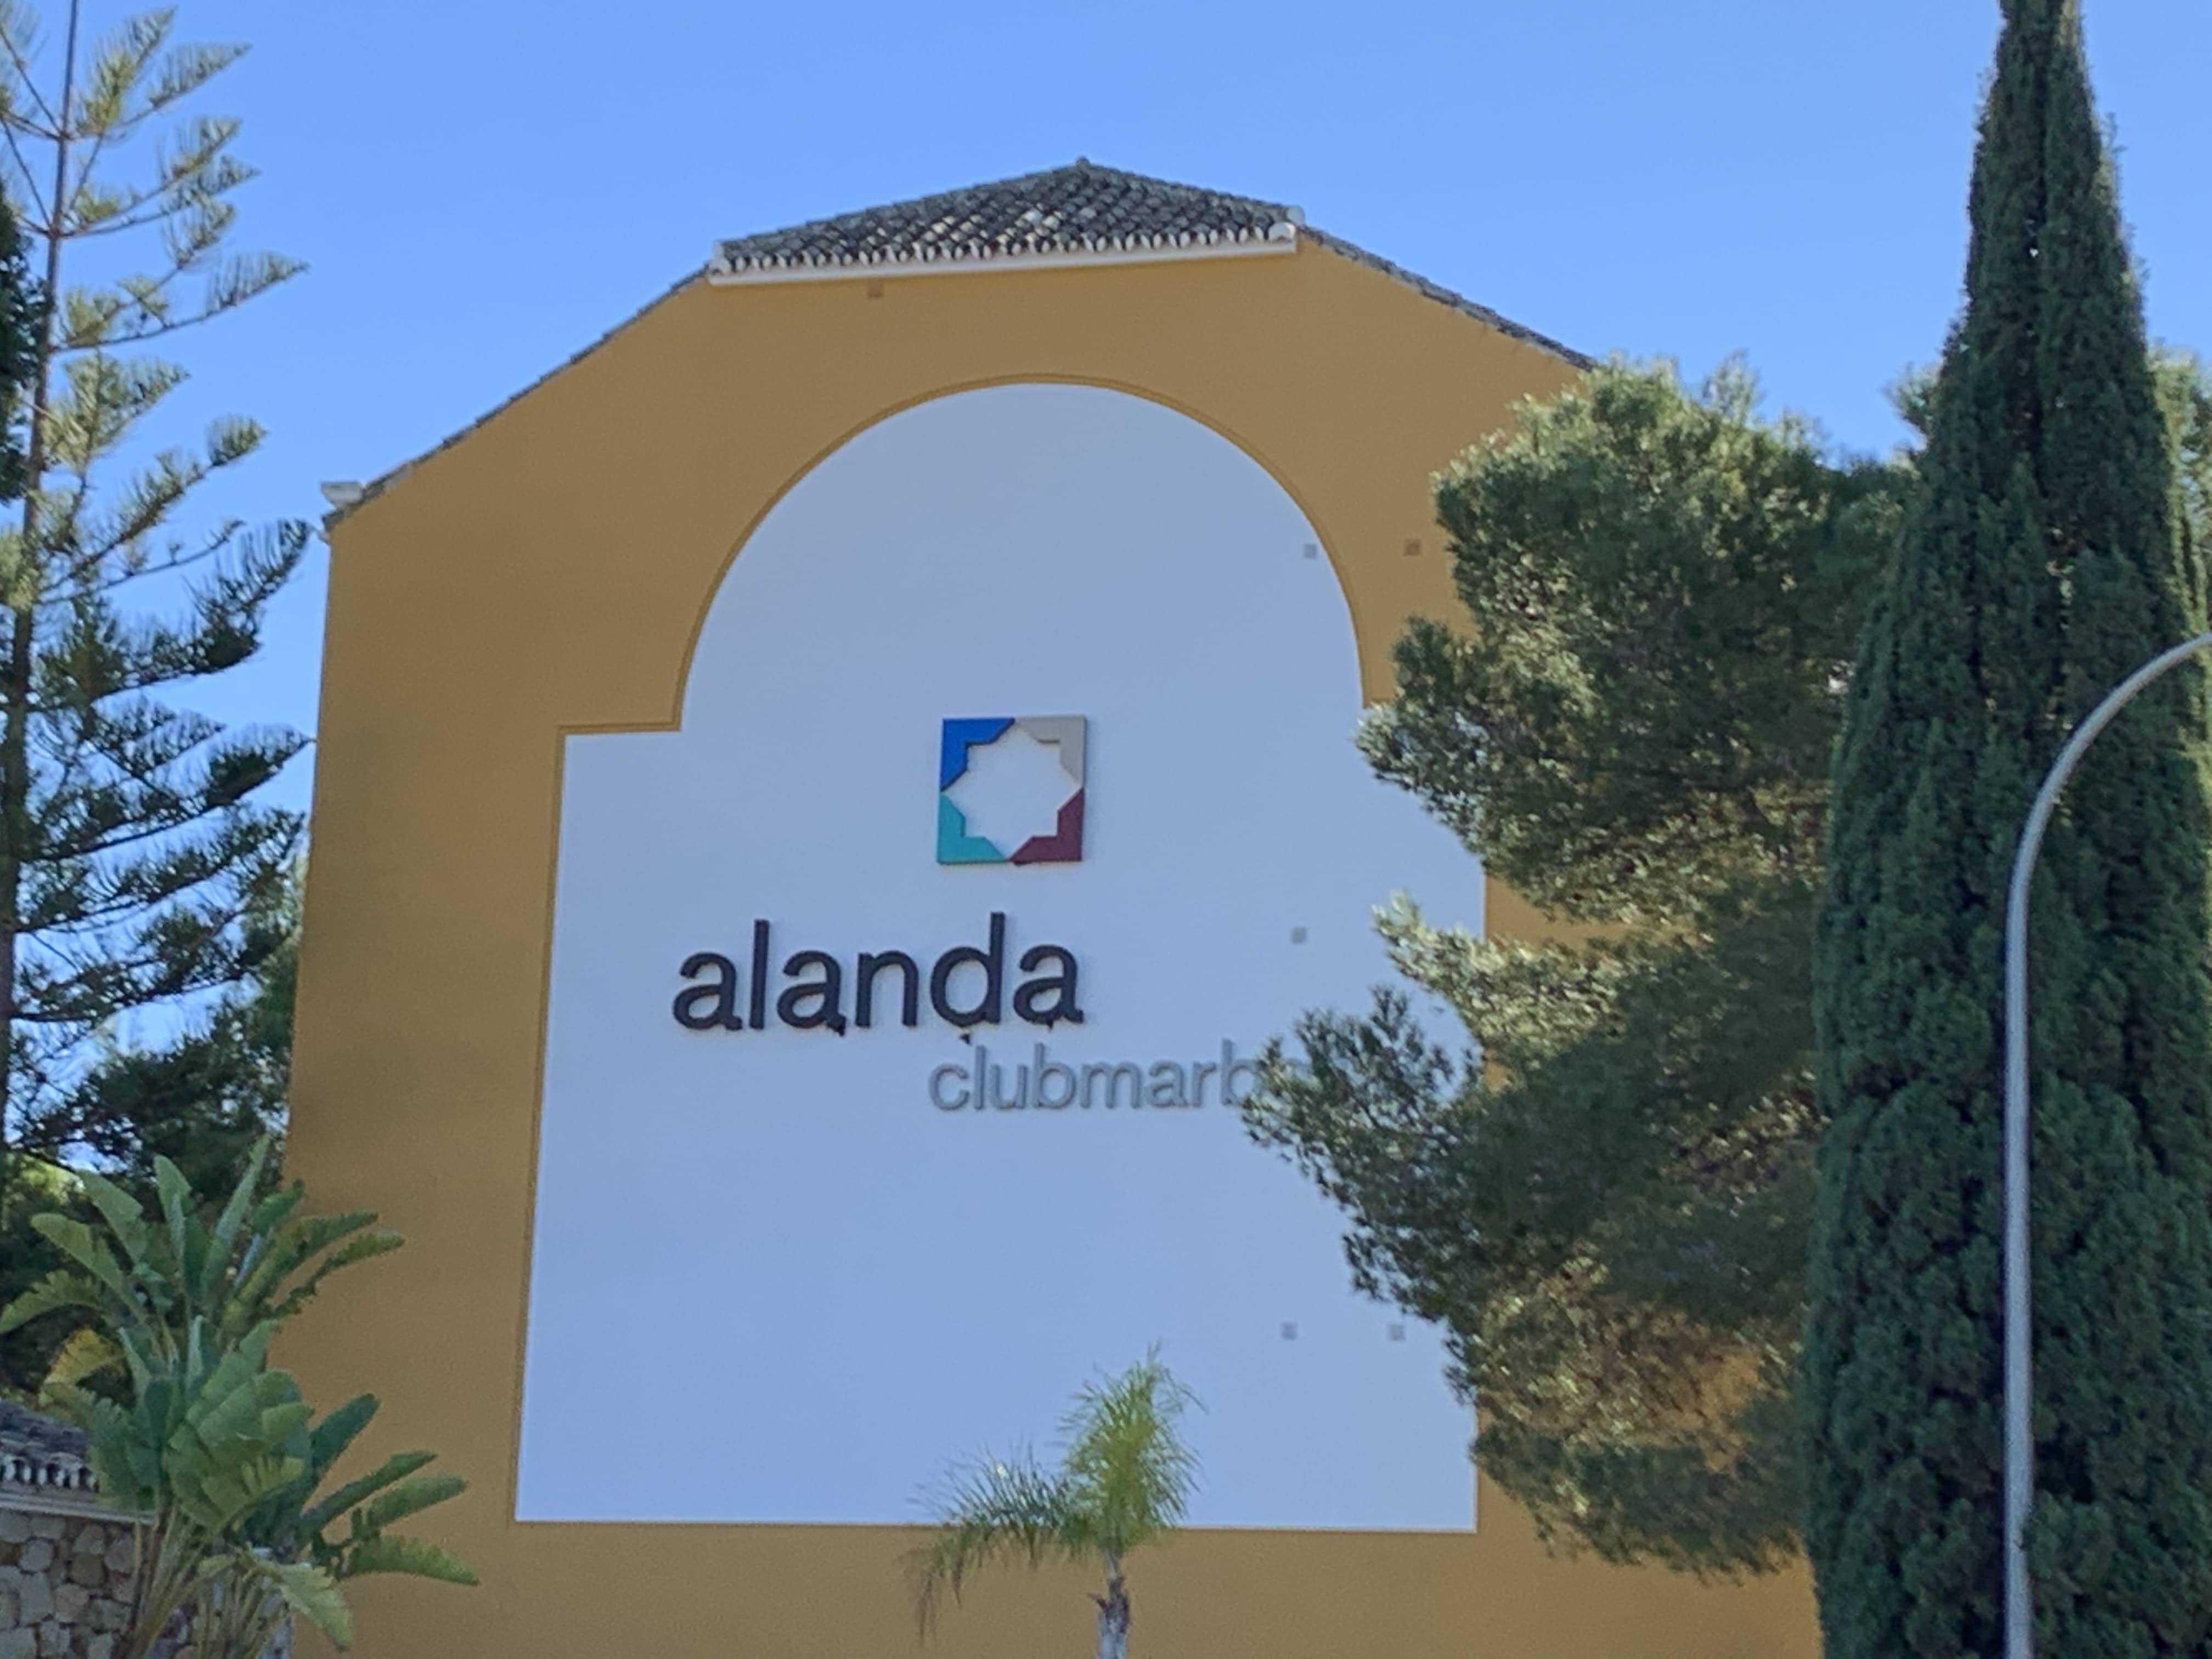 Alanda Club Marbella